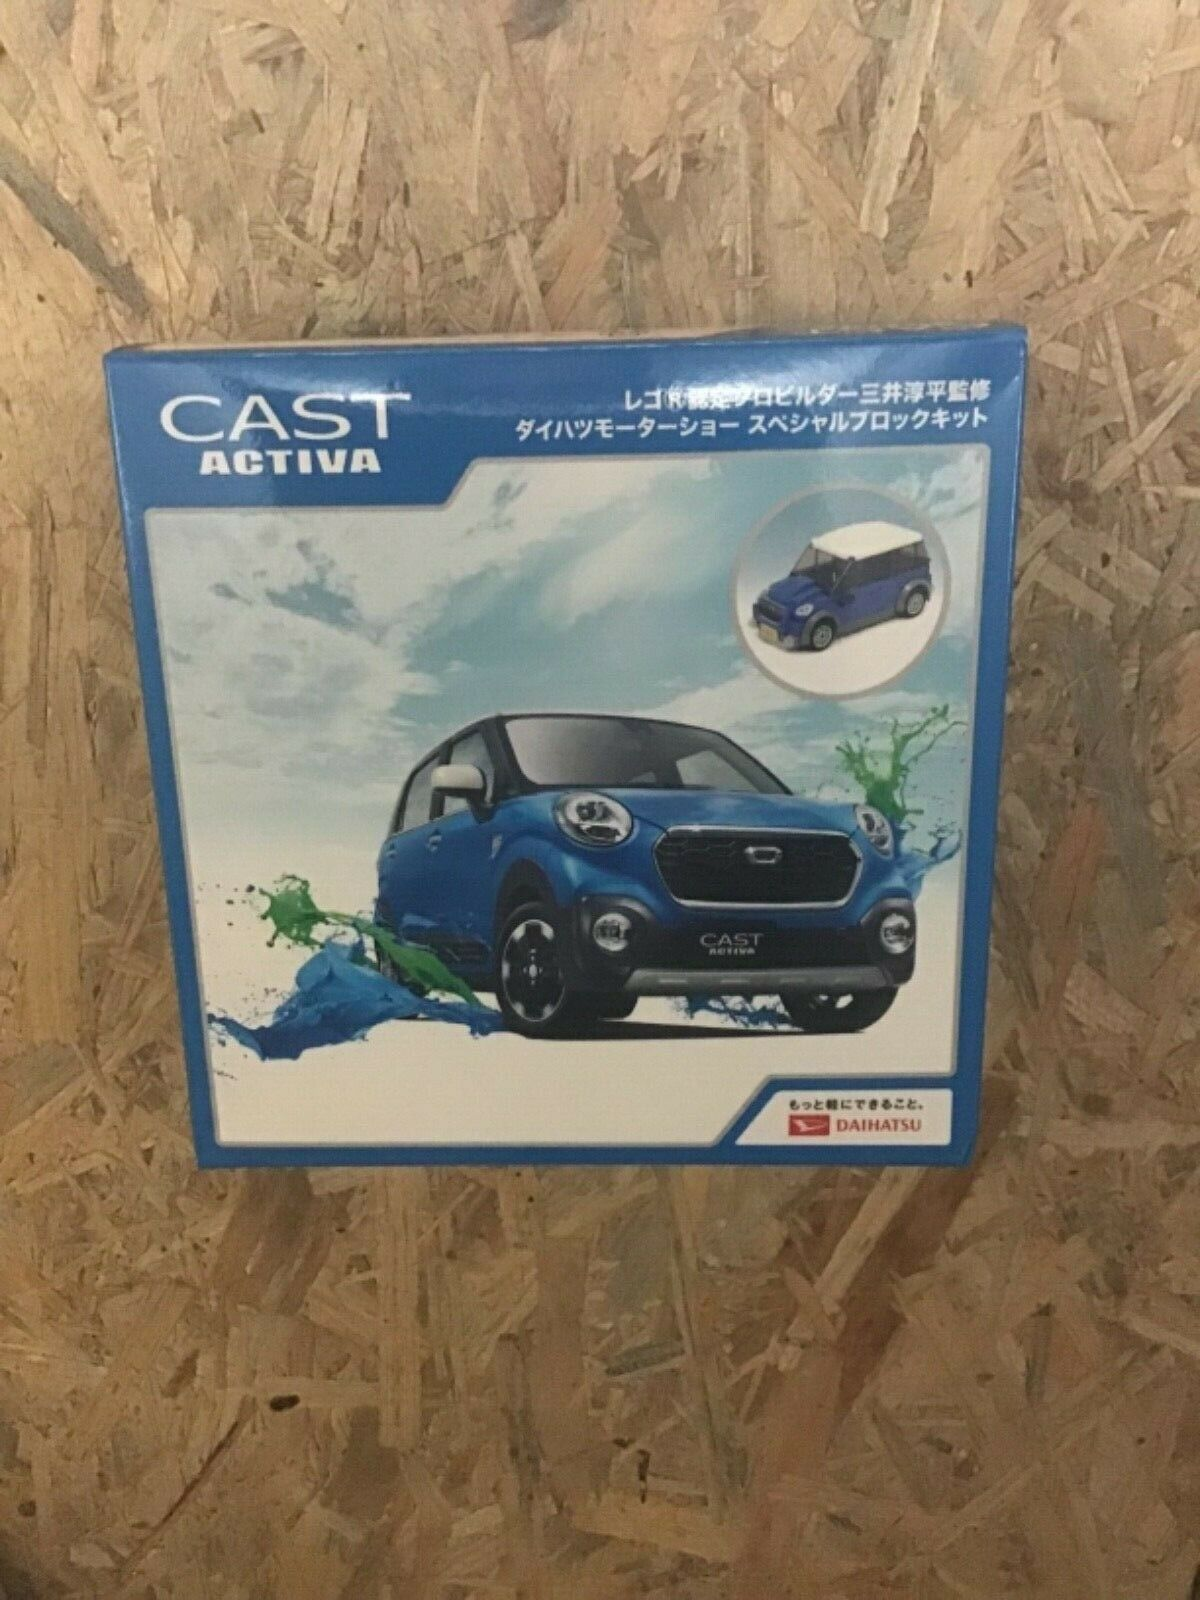 Lego Lego Lego certified professional - Daihatsu Cast Activa - Osaka - Jumpei Mitsui 521cbf